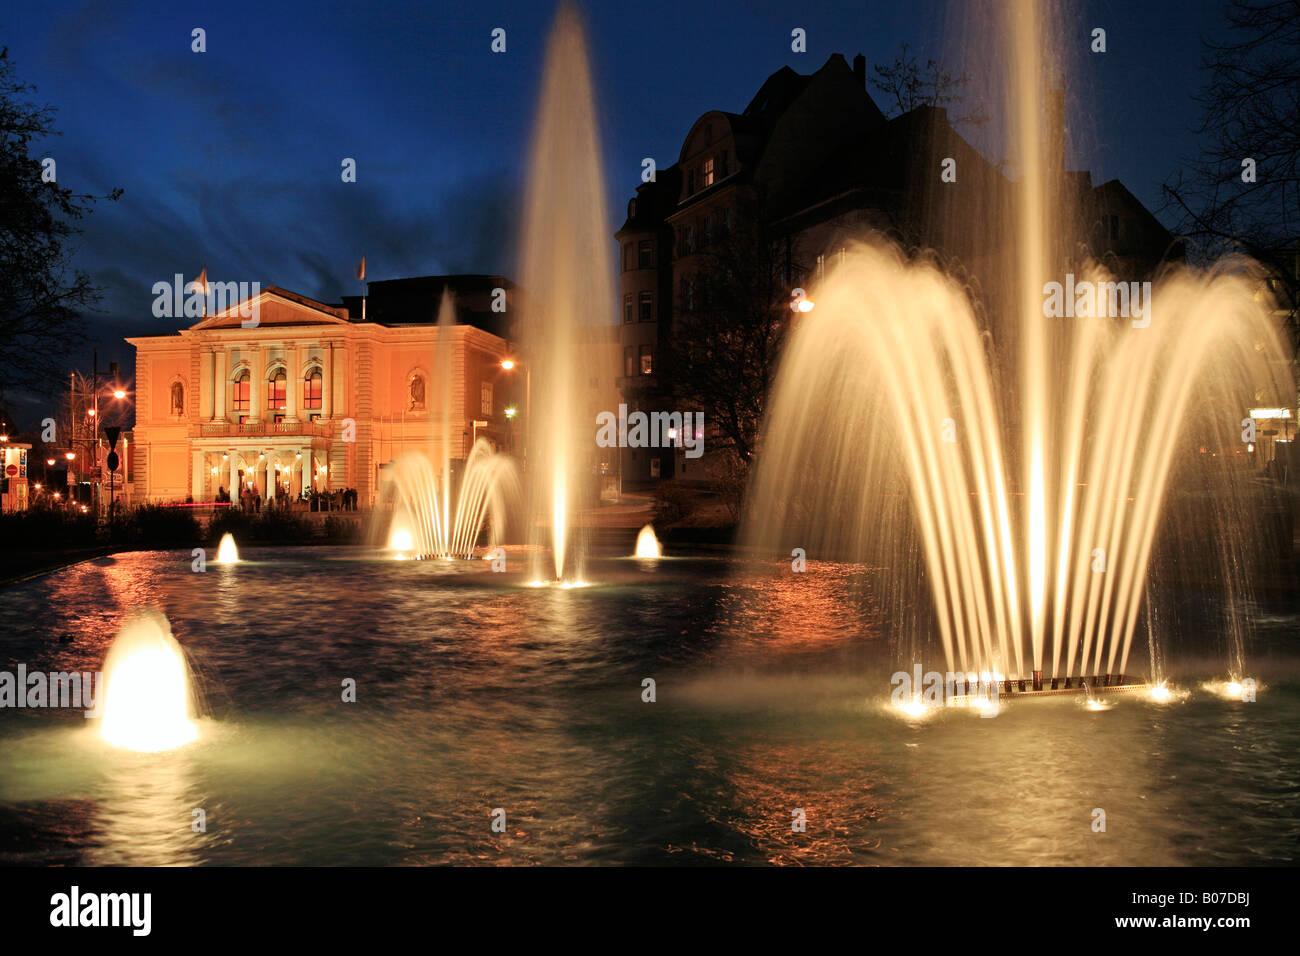 Opernhaus Halle (Saale), Germany - Stock Image